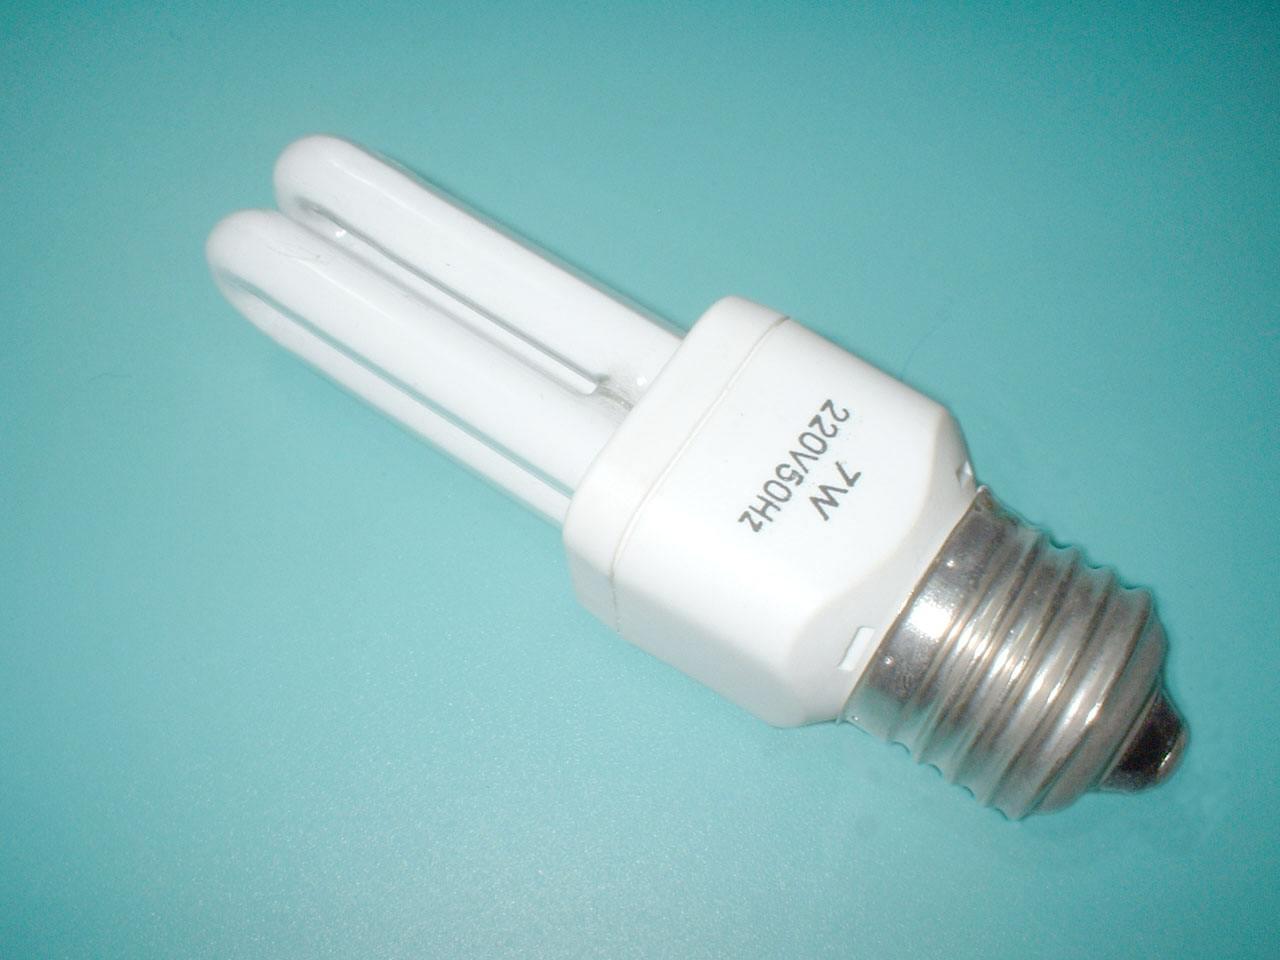 Utube energysaving lamp Energy saving and environmental protection